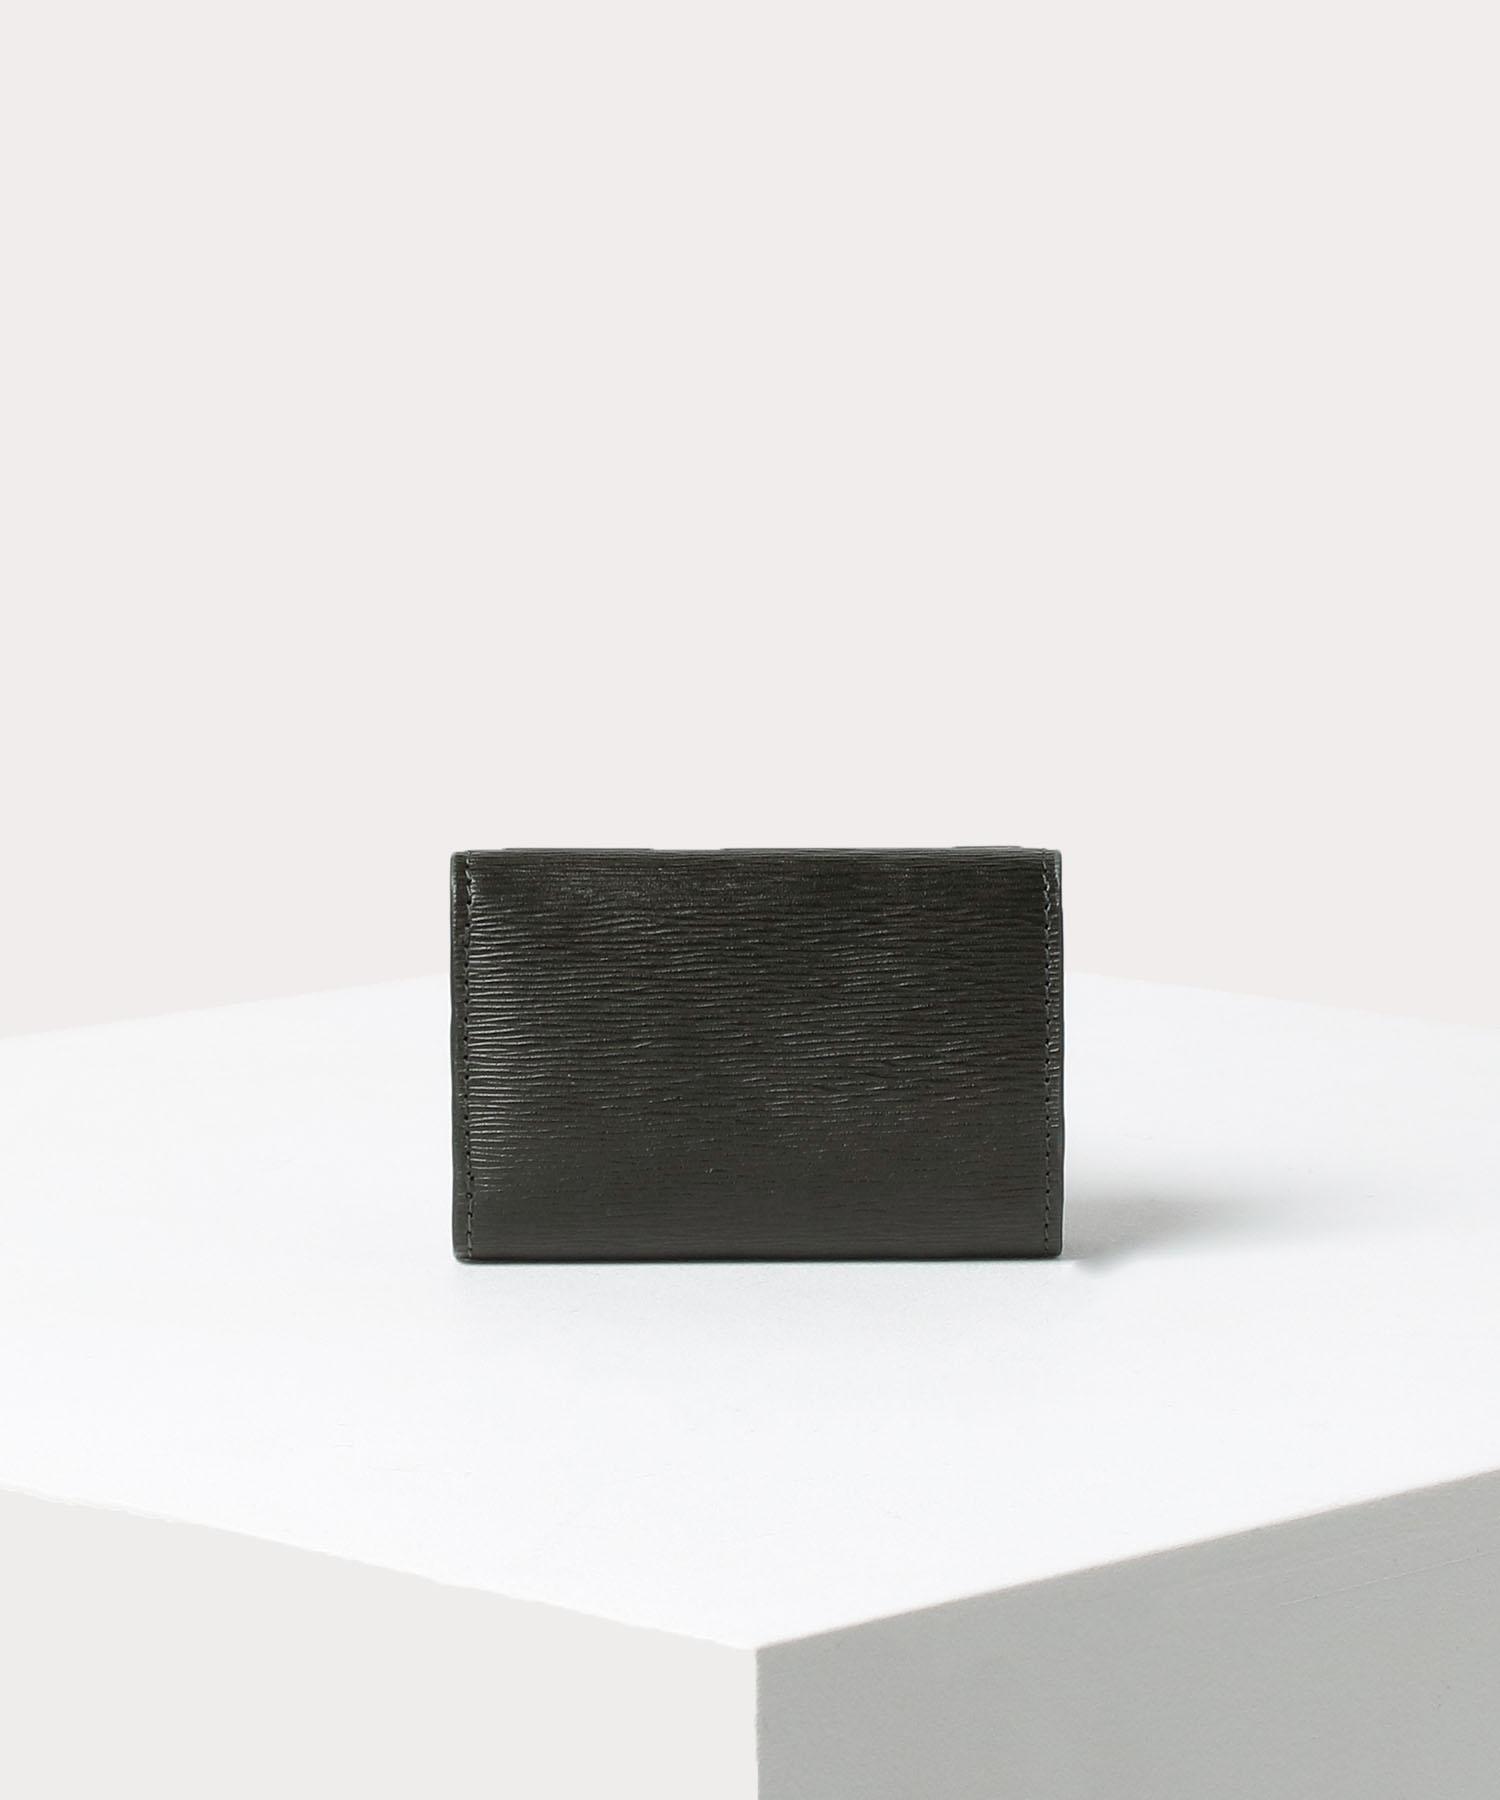 NEW ADVAN 三つ折り財布